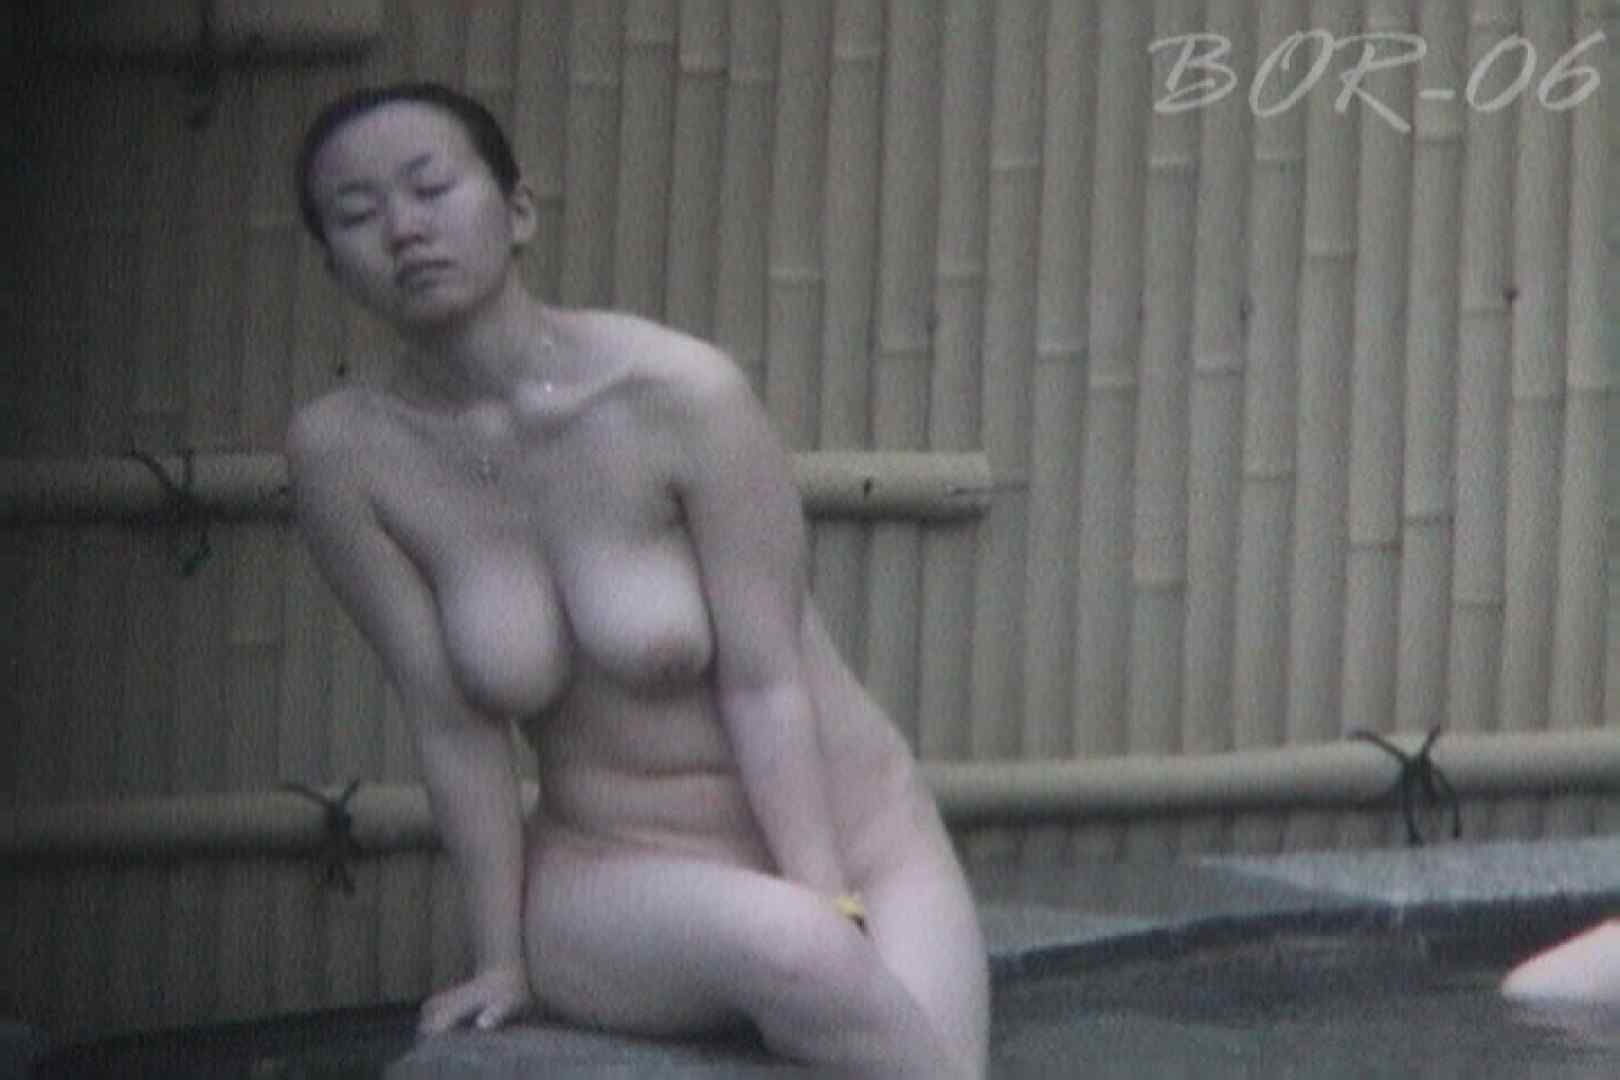 Aquaな露天風呂Vol.519 ガールの盗撮 おまんこ無修正動画無料 85枚